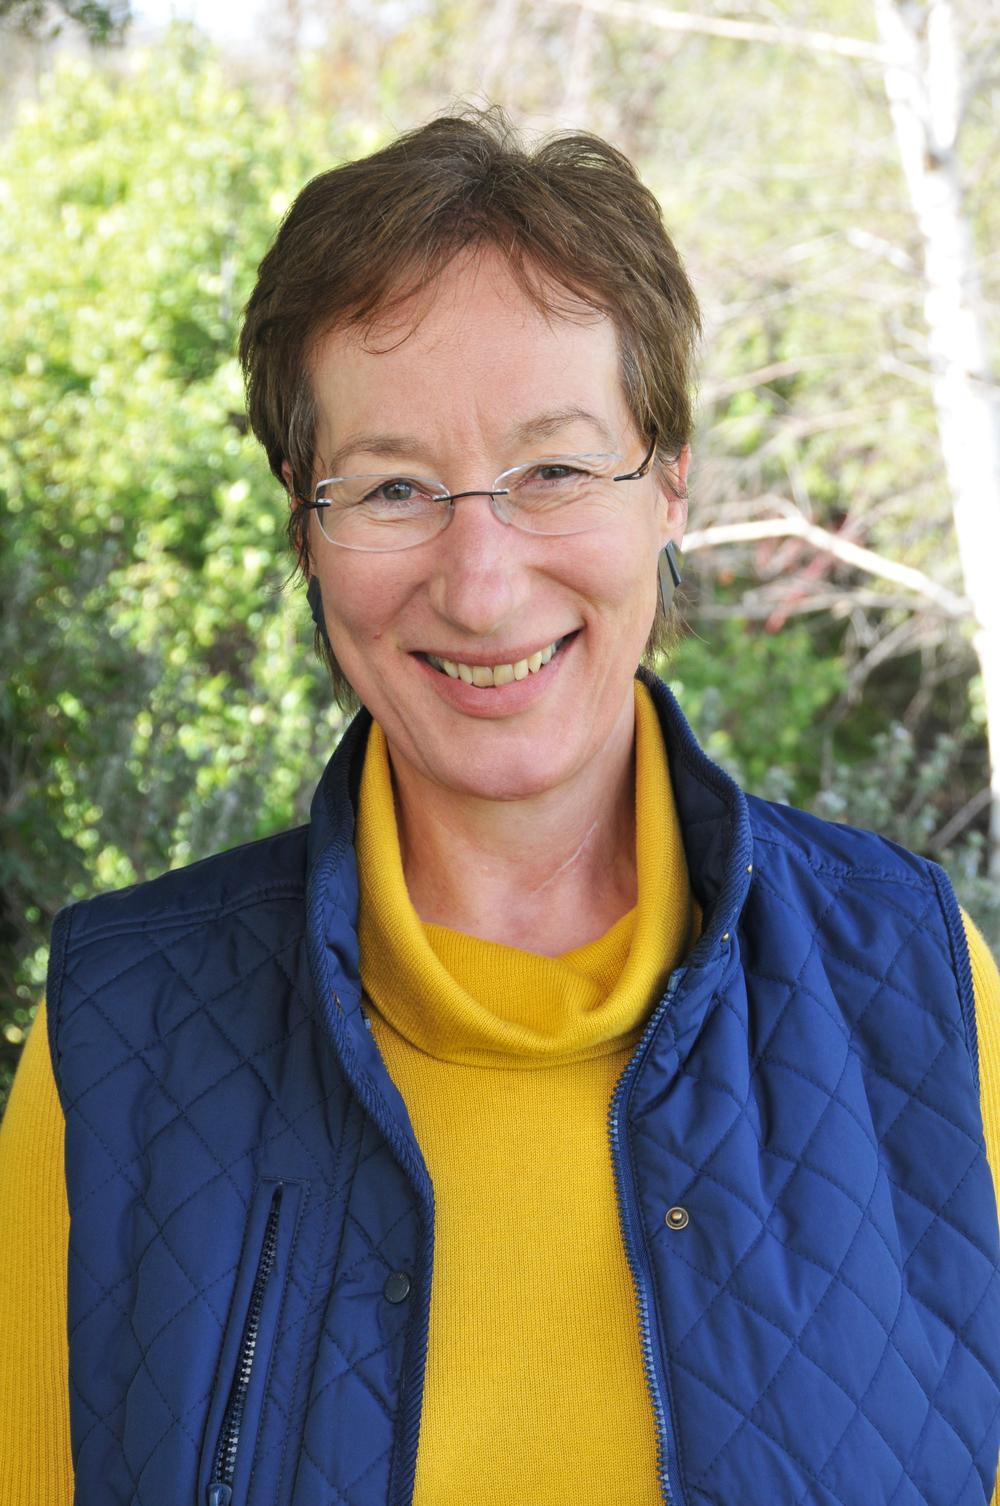 Dr Doris Blaesing